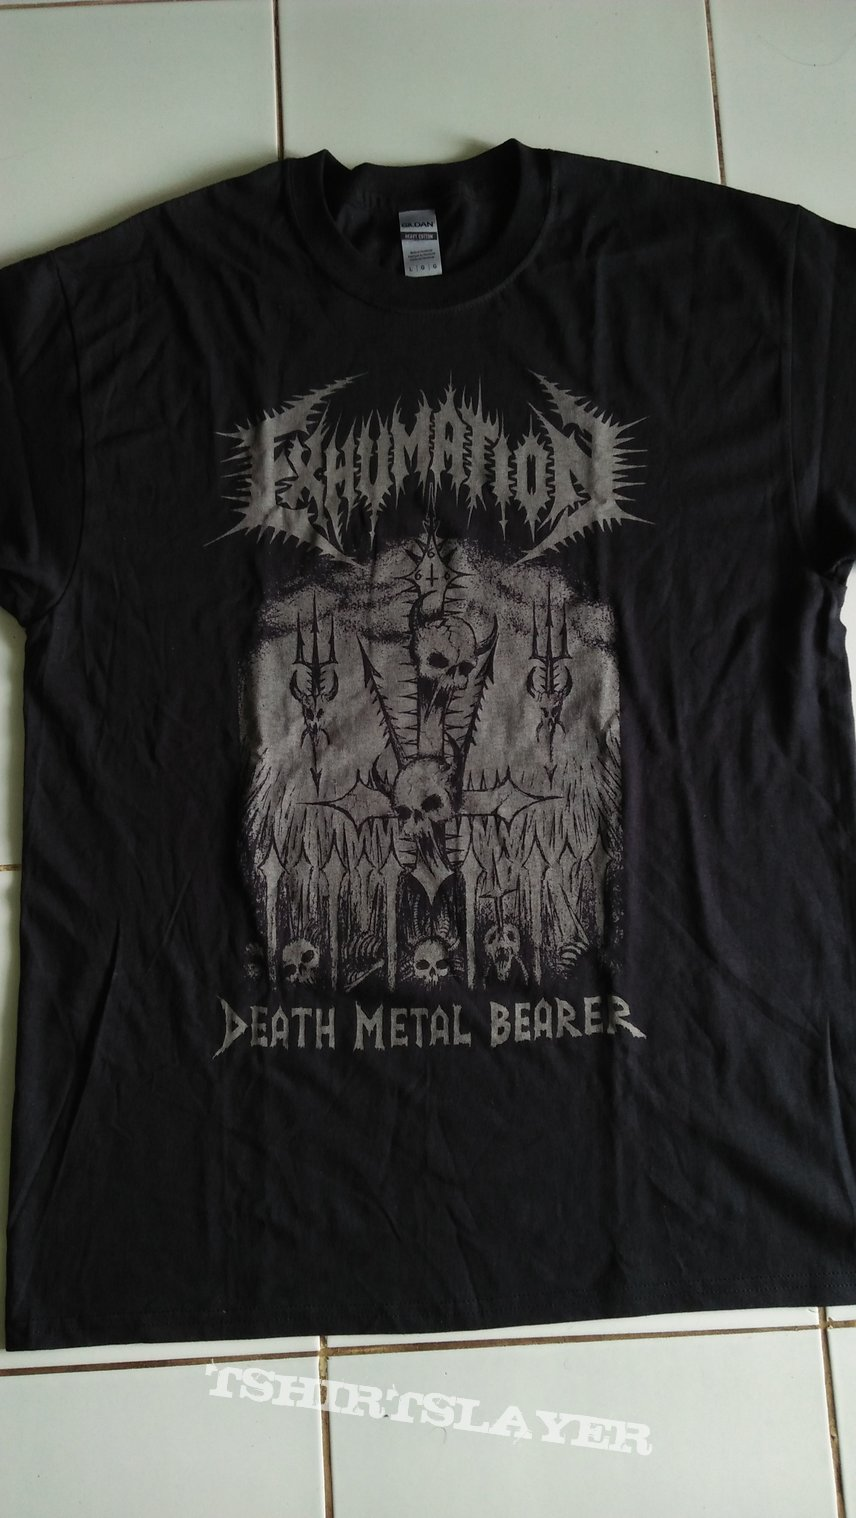 Exhumation - Death Metal Bearer shirt